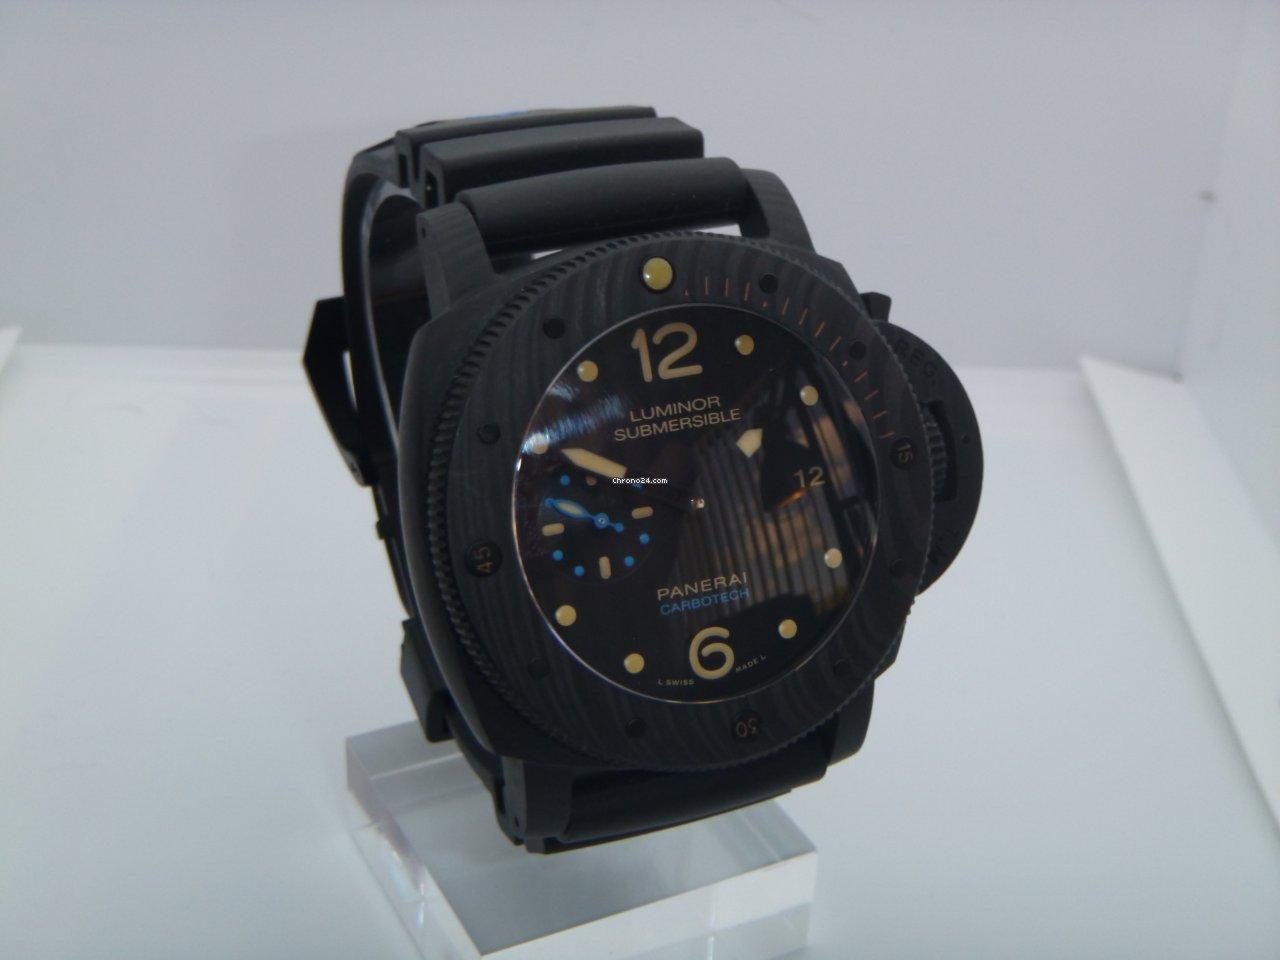 87b13f29abc Panerai Luminor 1950 - Todos os preços de relógios Panerai Luminor 1950 na  Chrono24